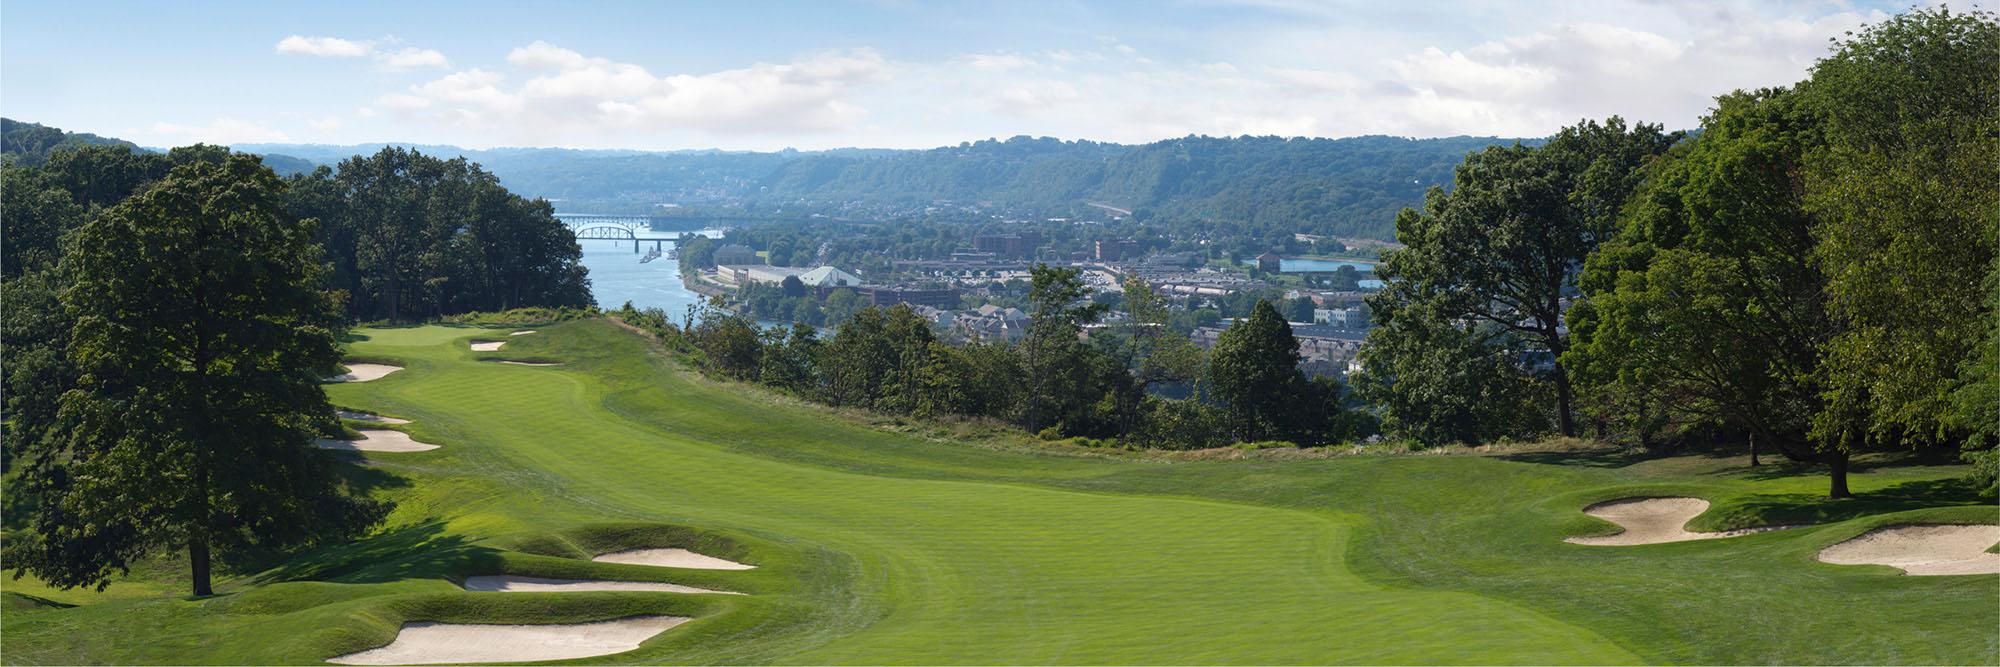 Golf Course Image - Longue Vue Club No. 4